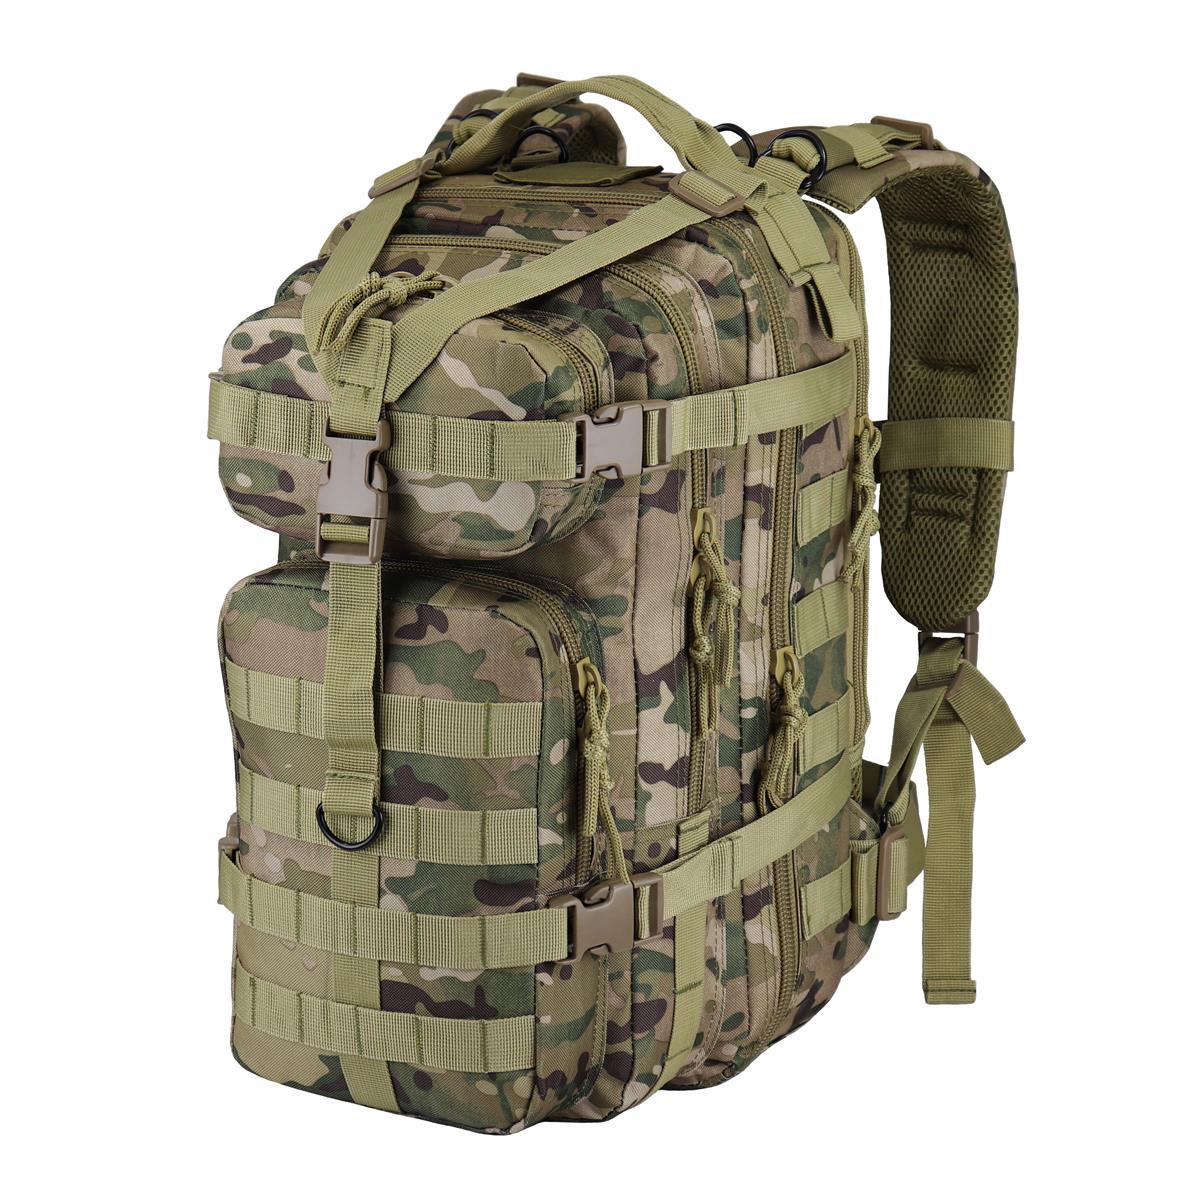 Batoh US ASSAULT Backpack multicamo 25l molle CMG